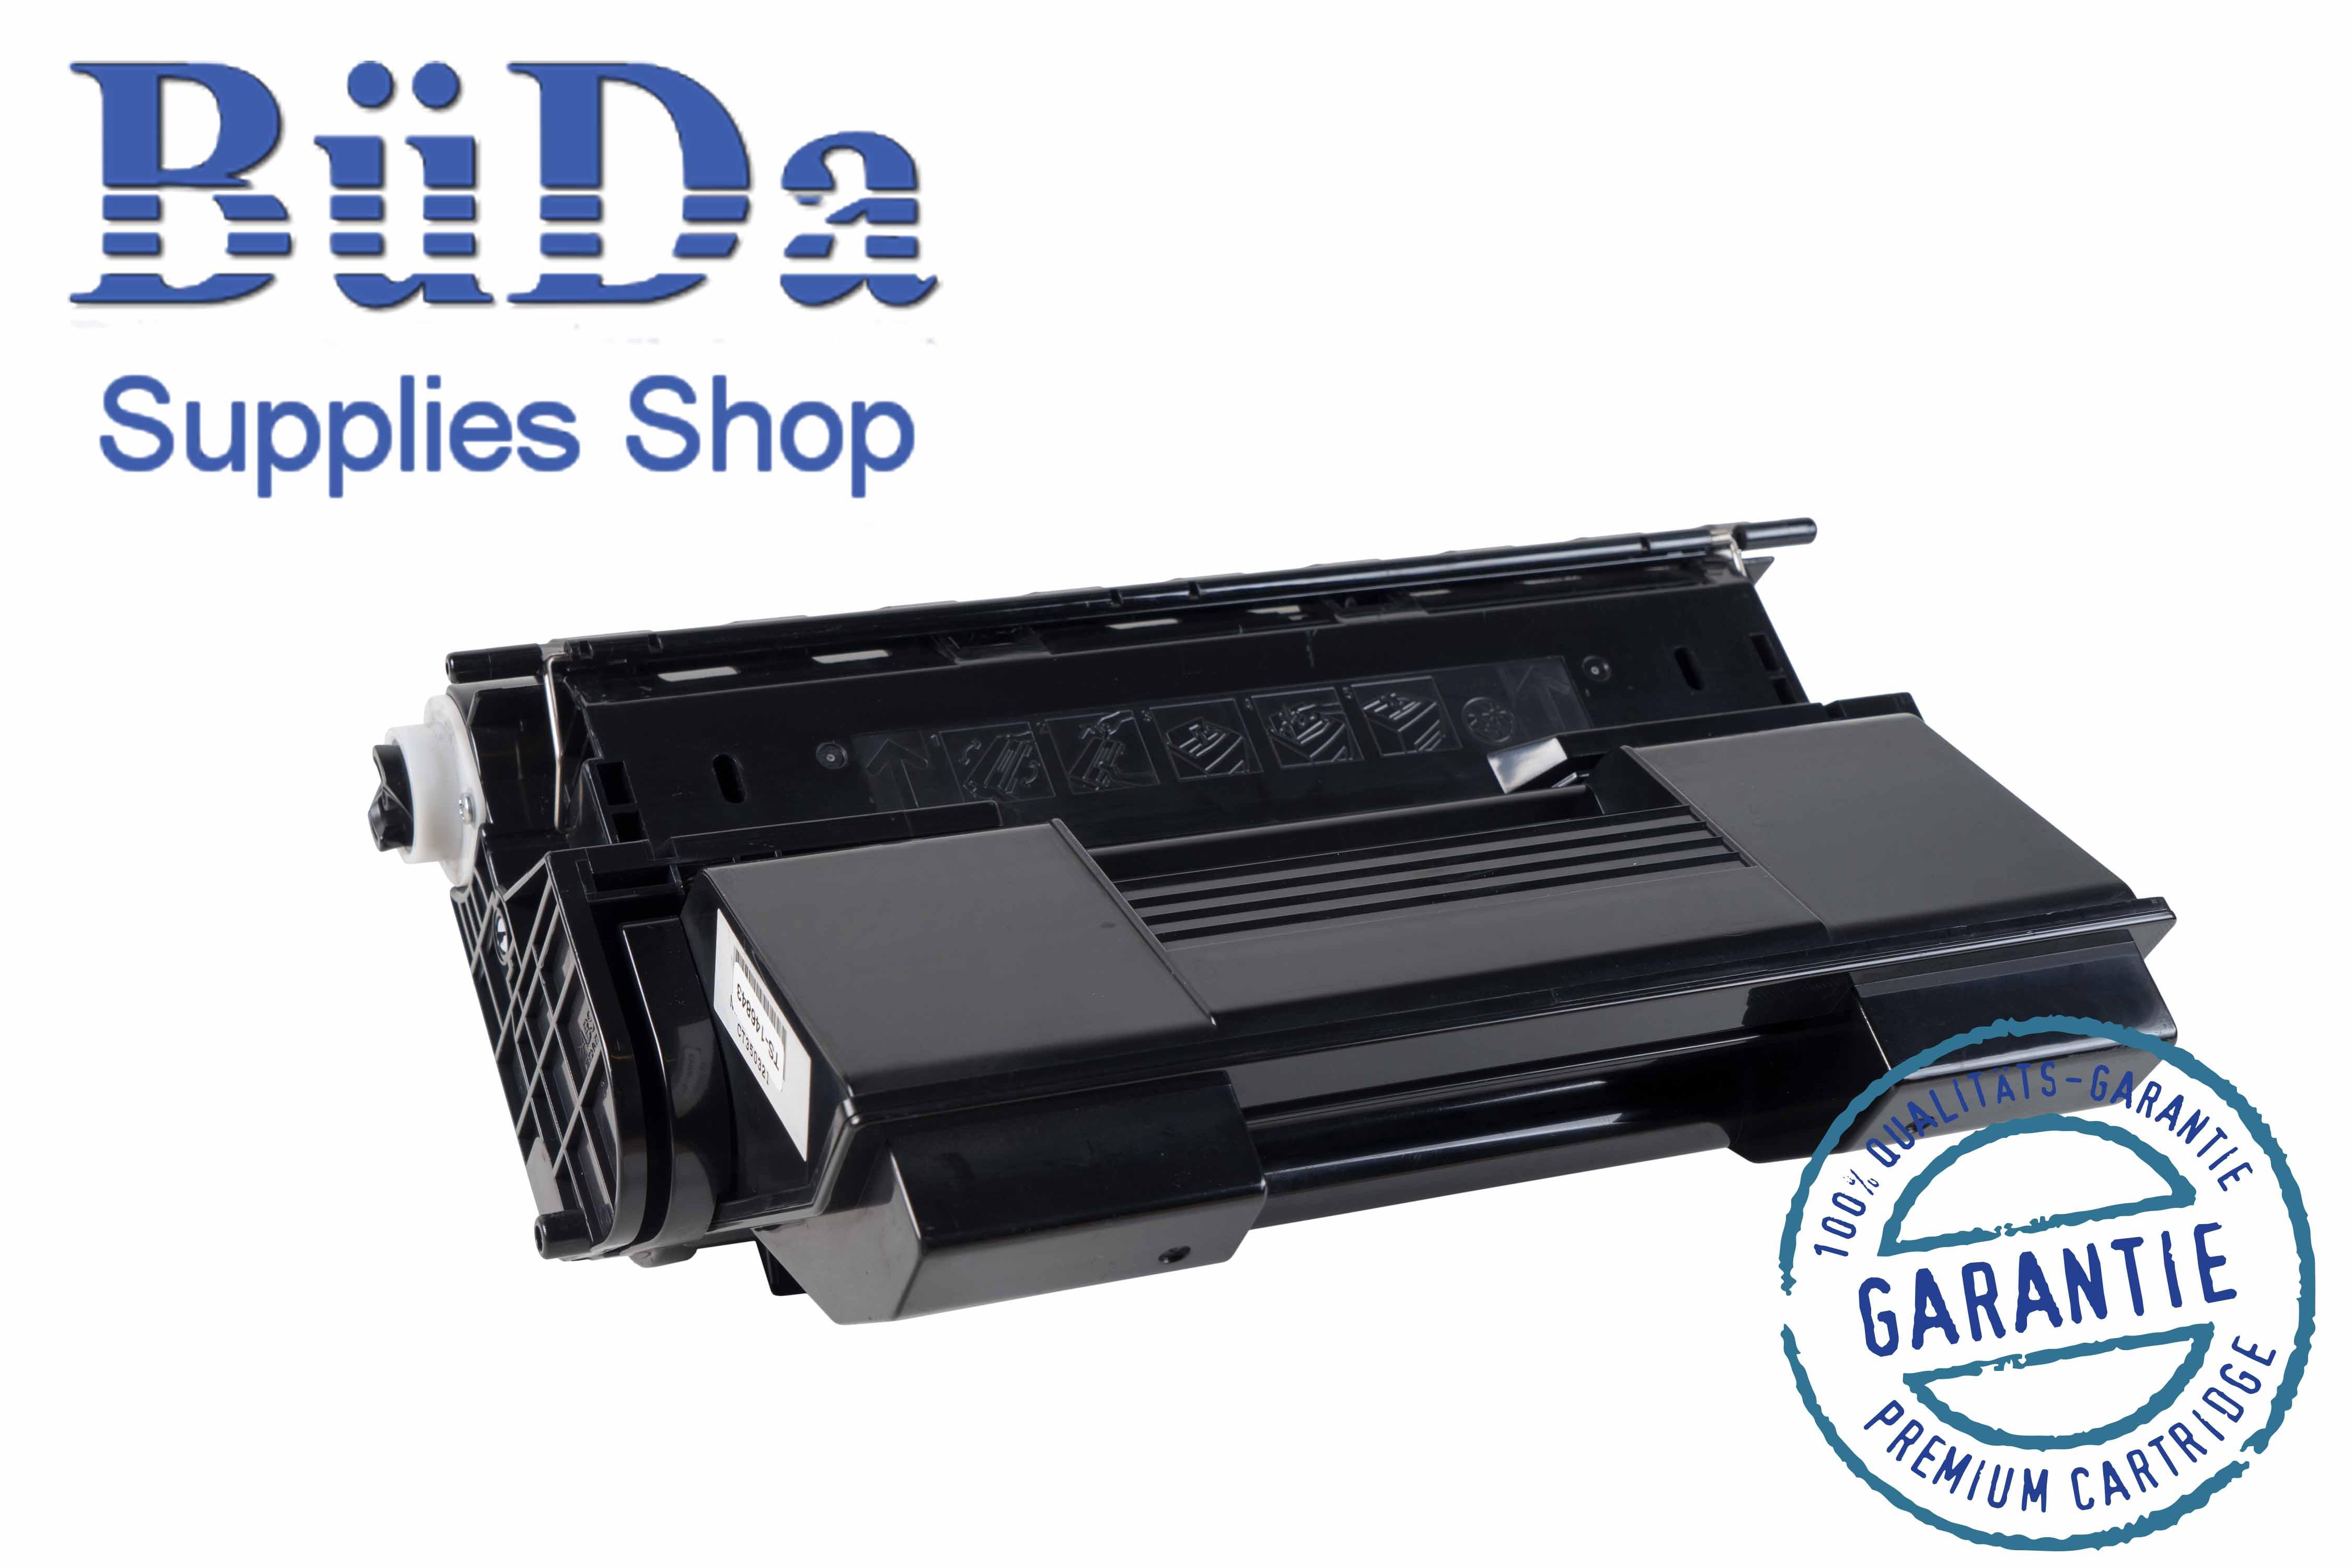 Toner-Modul komp. zu TN-1700 black 17000 Seiten